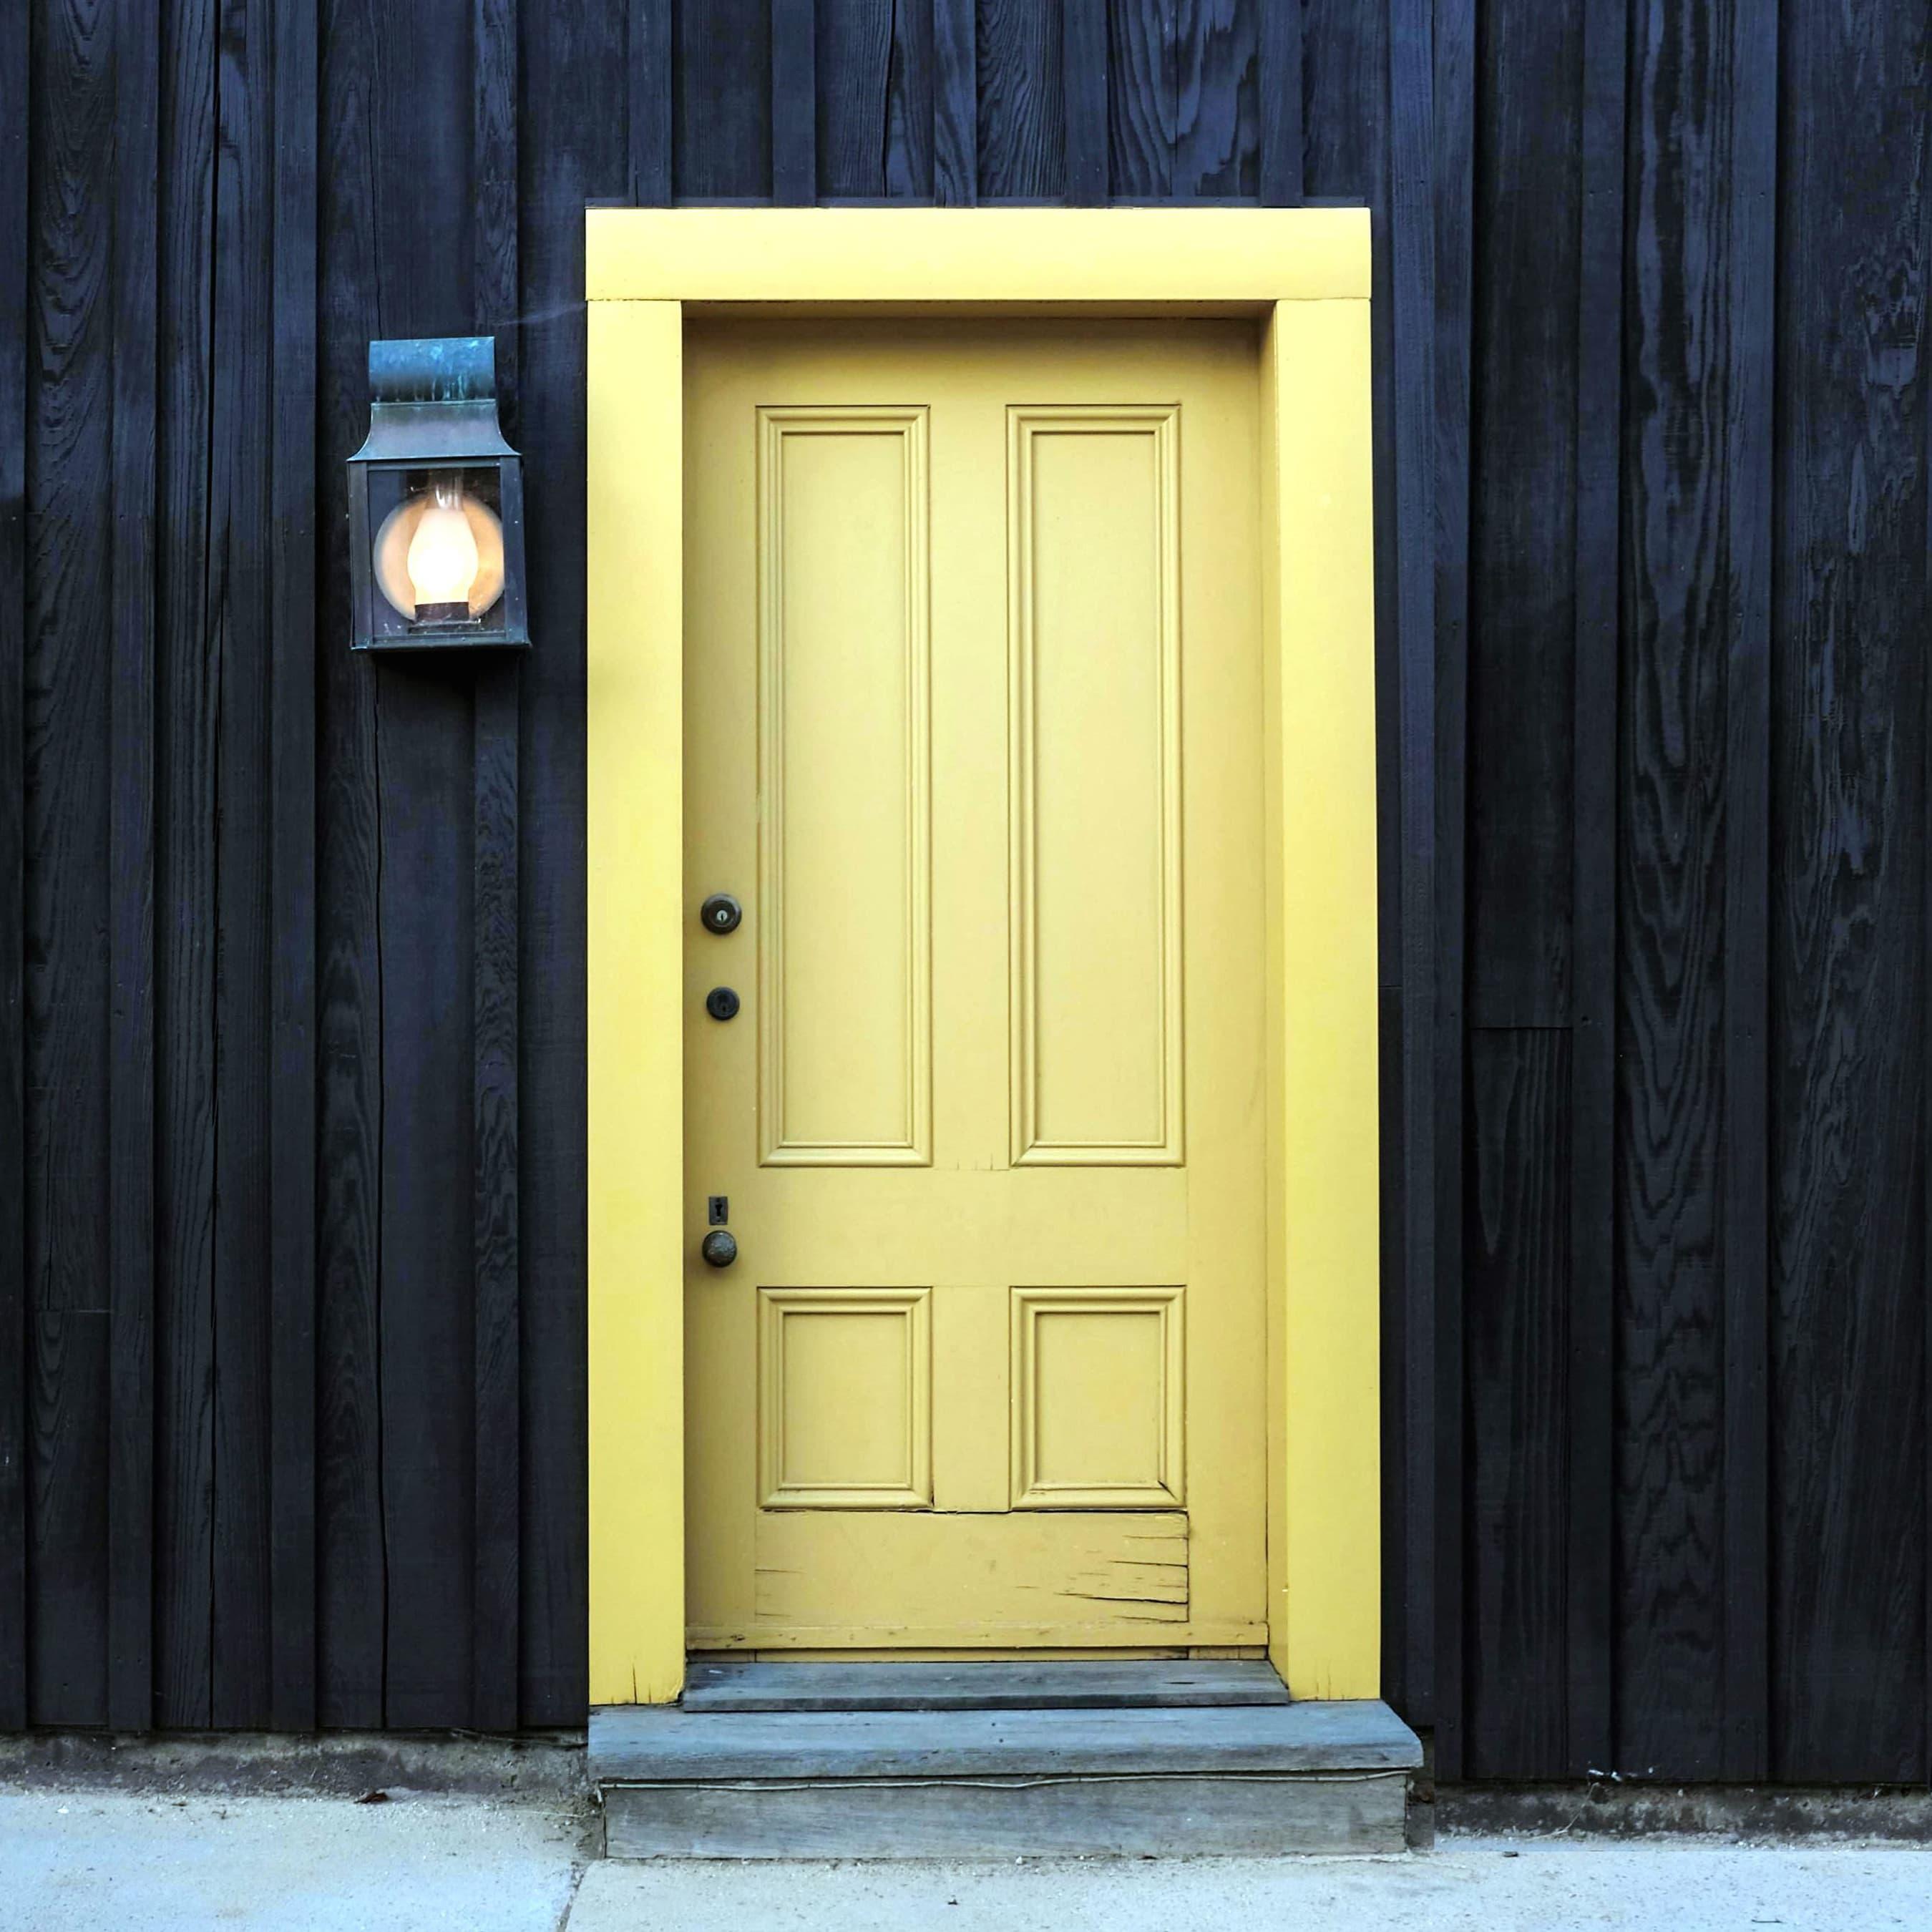 How can you unlock a door using a magnet?